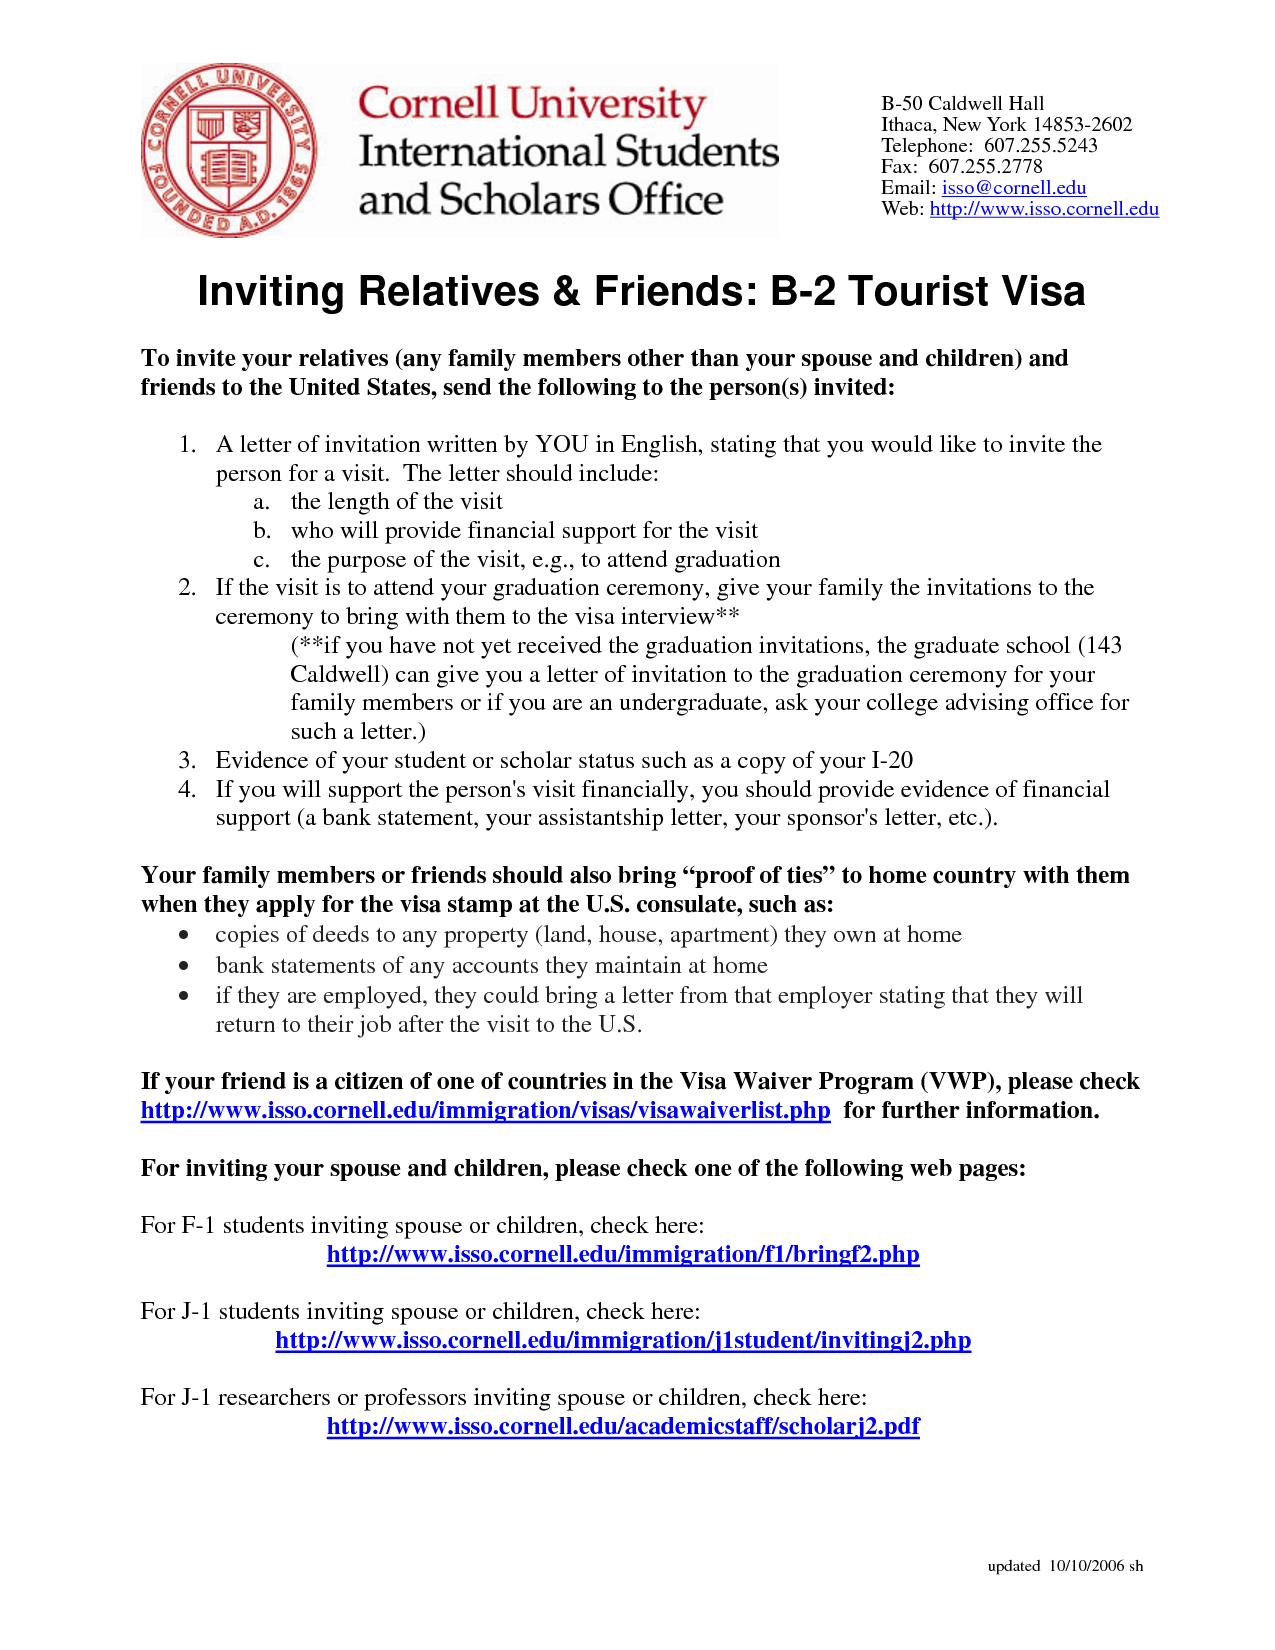 sample letter of support for tourist visa application